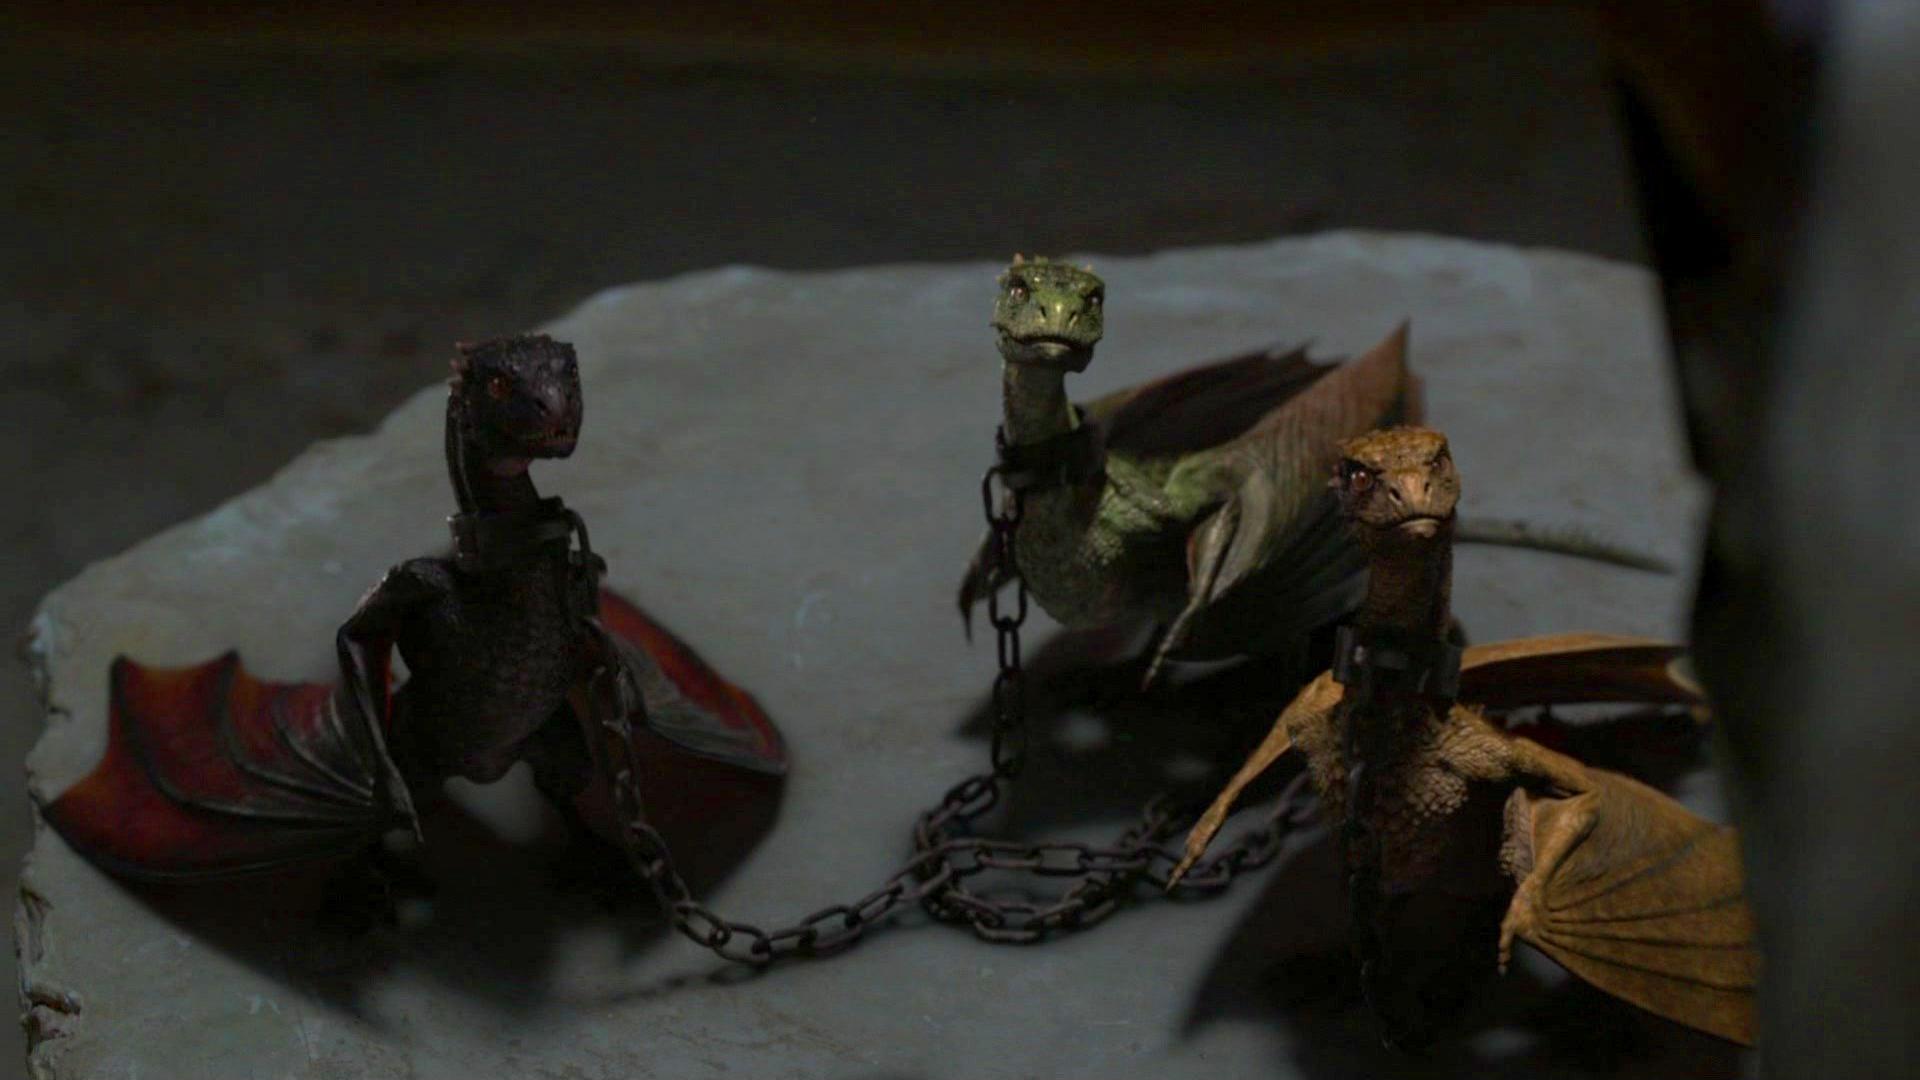 Dragons game of thrones colors - Game Of Thrones Drogon Rhaegal Viserion 242749 Jpg 1920 1080 Fav Tv Pinterest Dragons And Songs